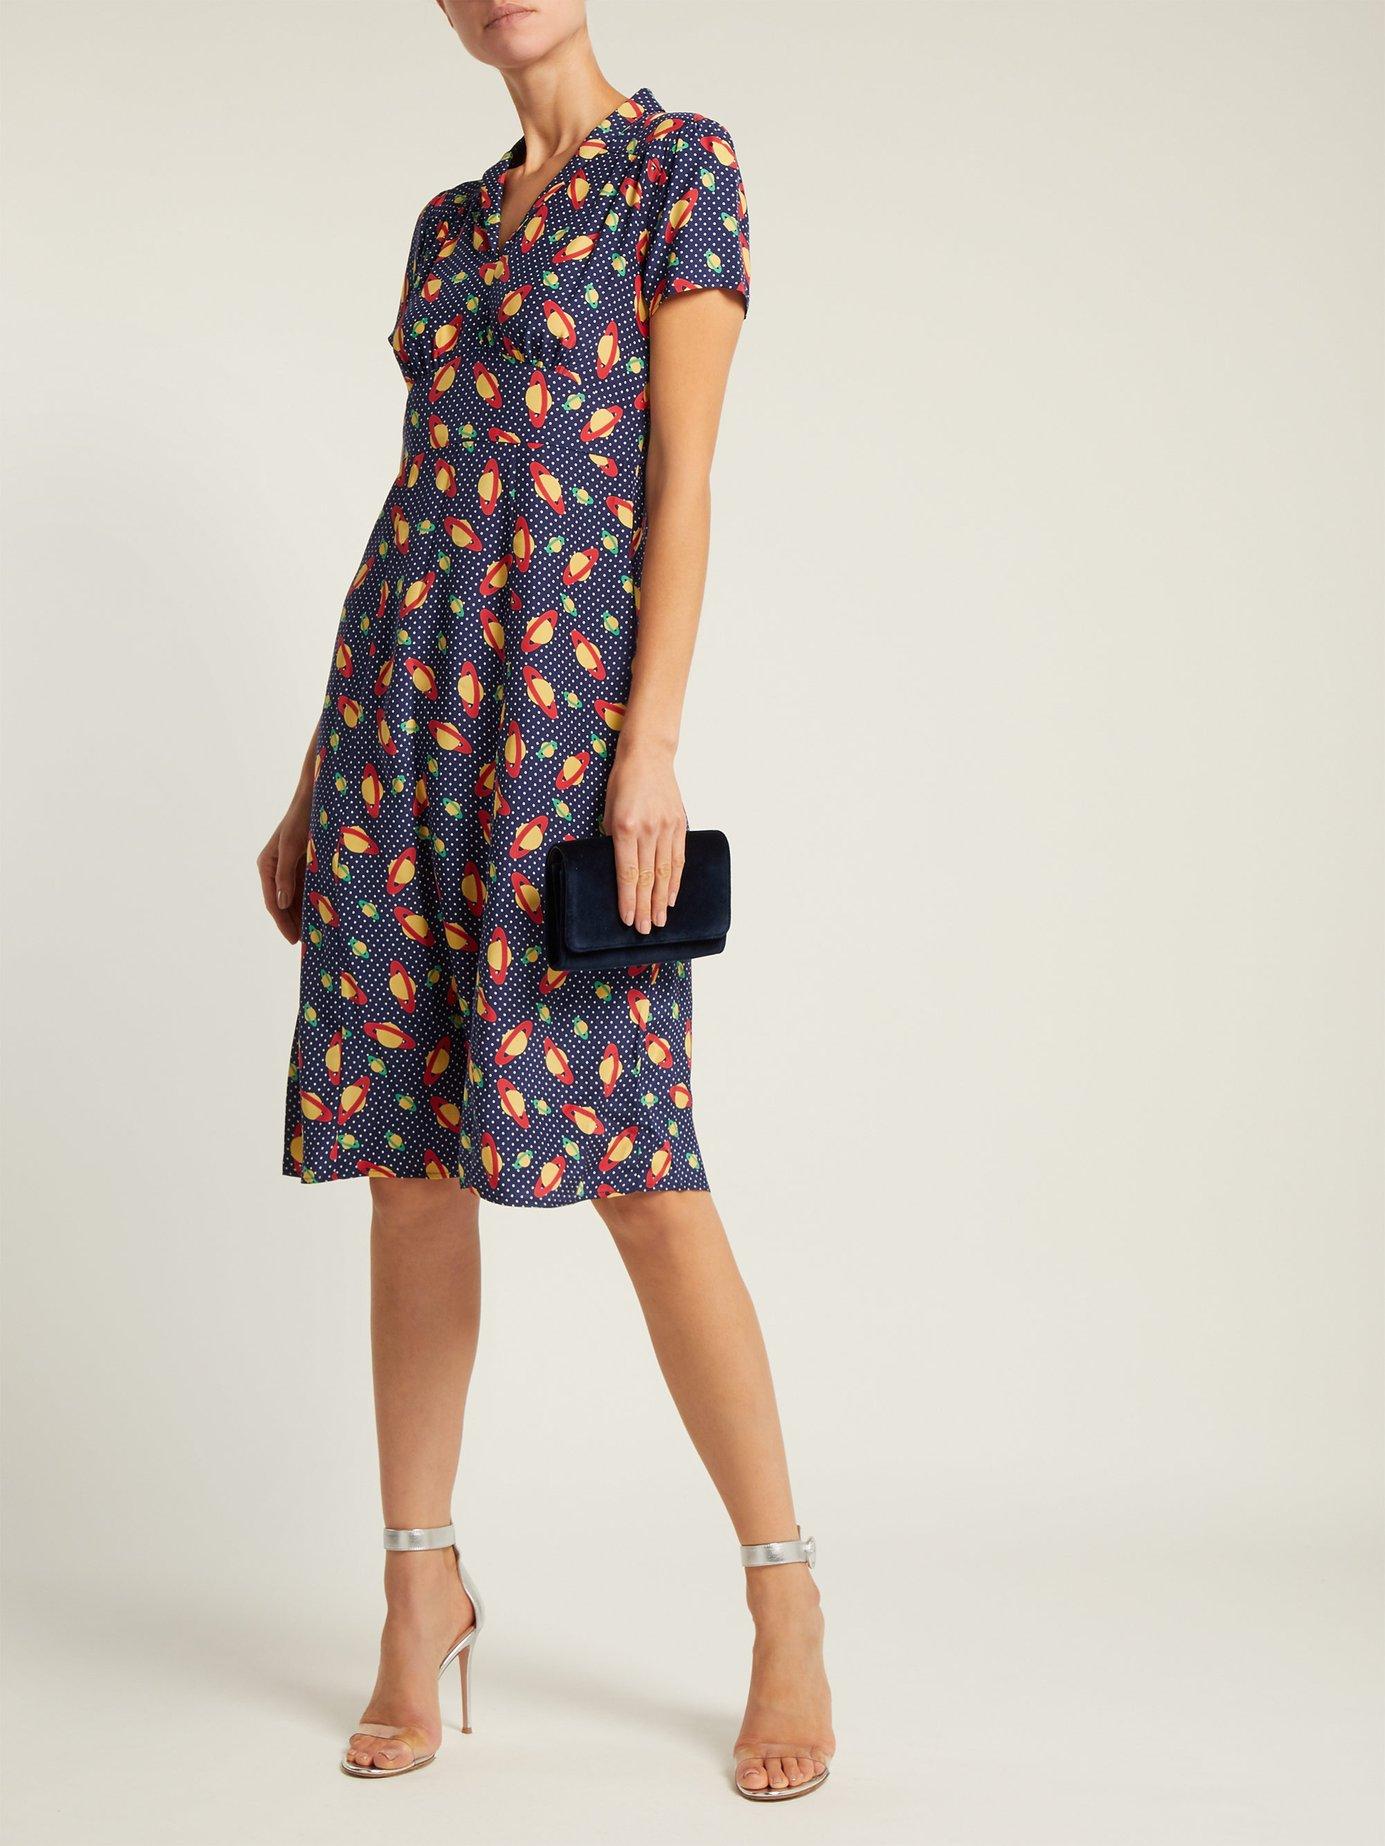 Morgan planet-print silk dress by Hvn